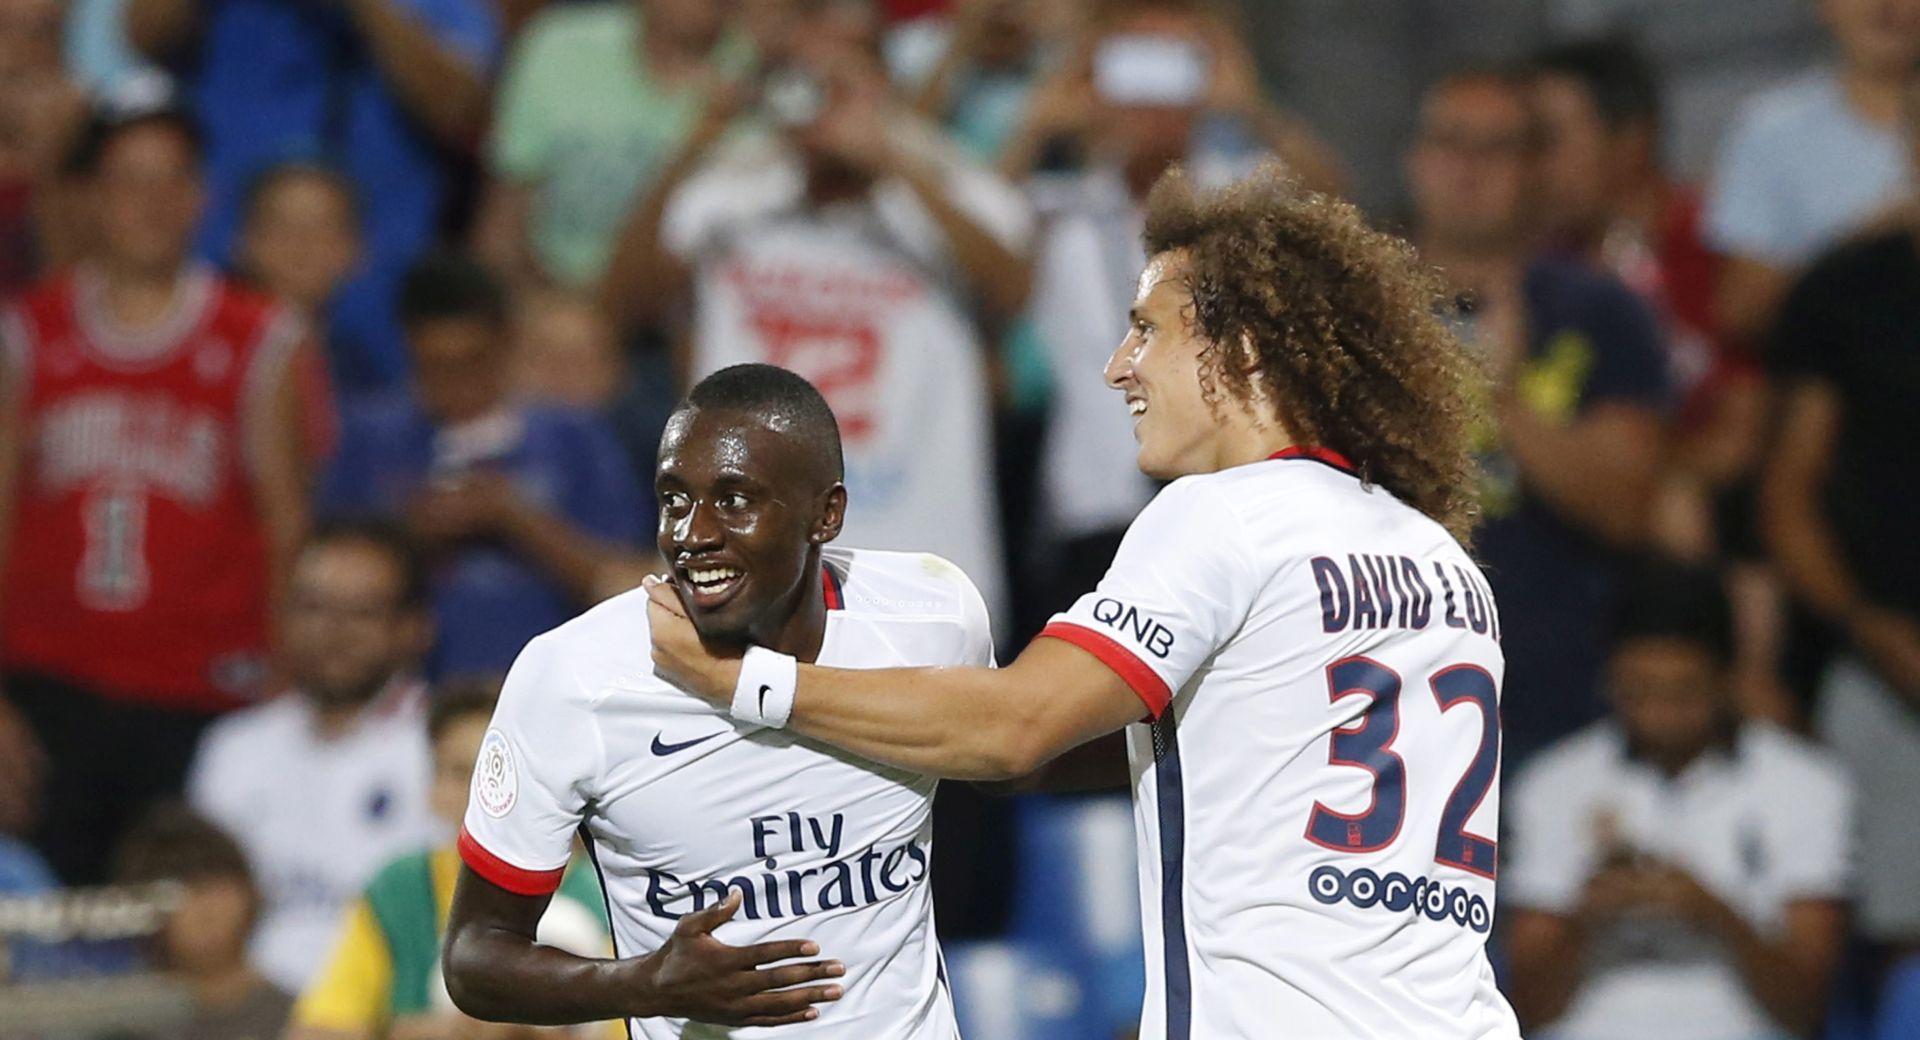 VIDEO: PSG I DALJE STOPOSTOTAN Matuidi srušio Montpellier